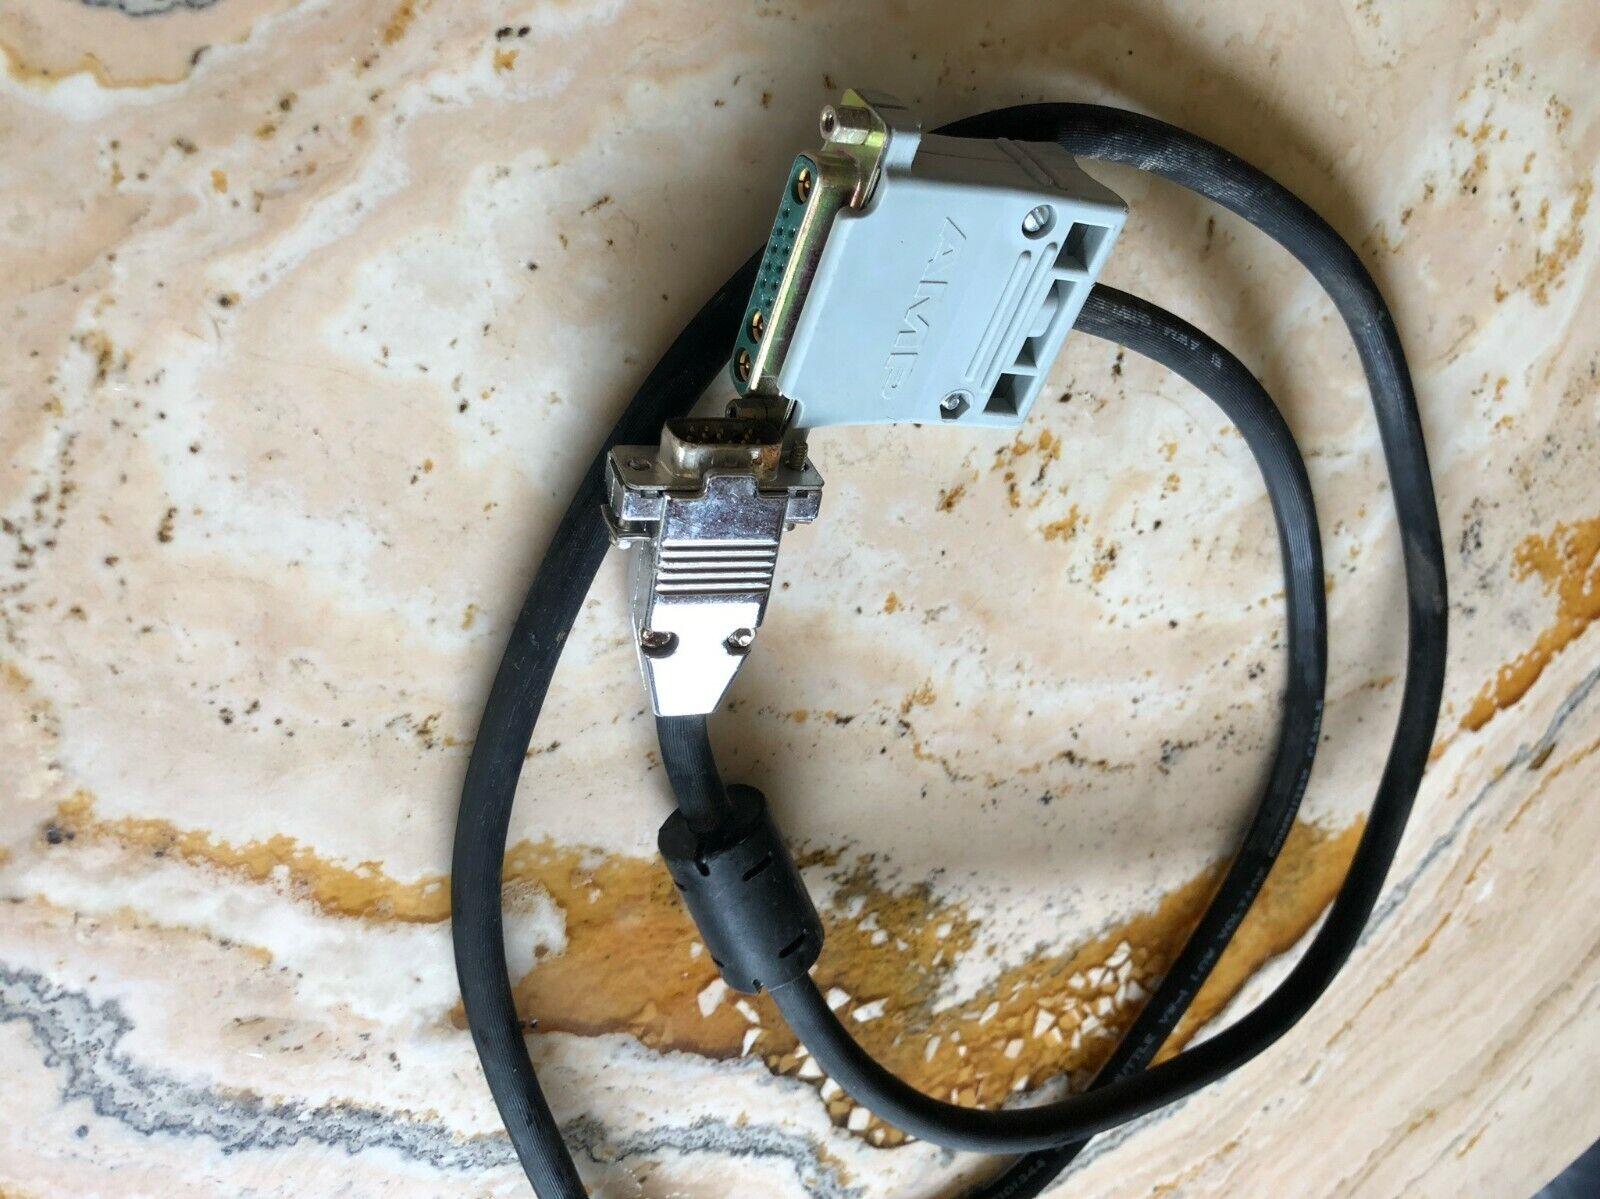 Adapter Kabel DB13W3W auf VGA für Sun/Sony Monitore zu Standard VGA Grafikkarte